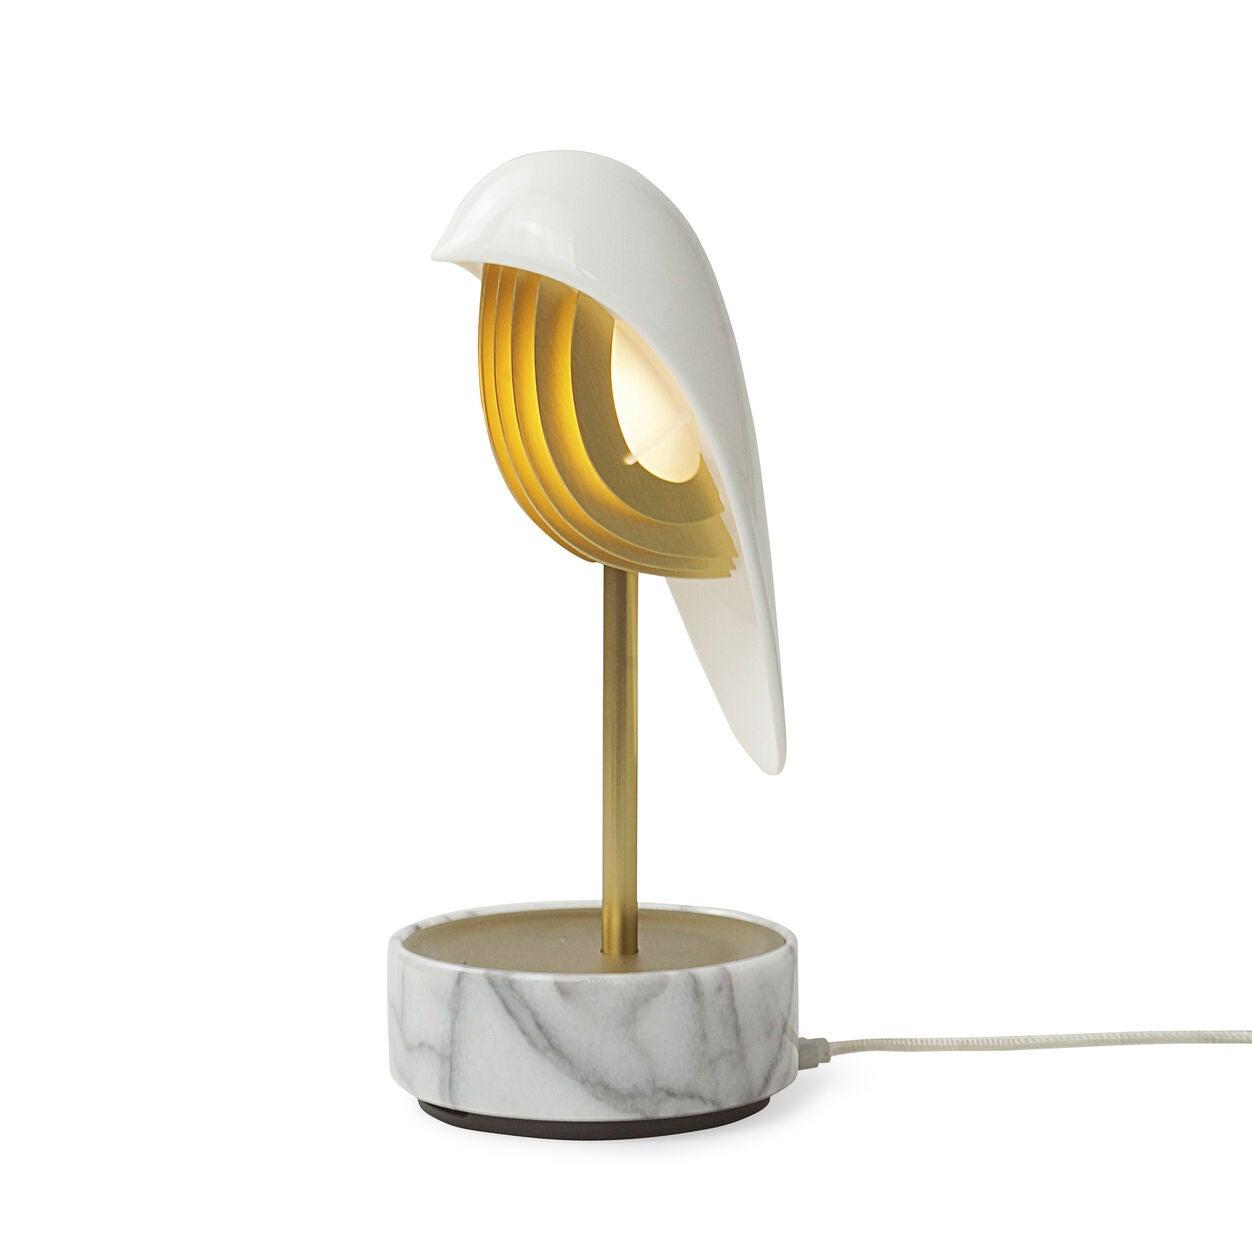 Alarm clock shaped like a bird